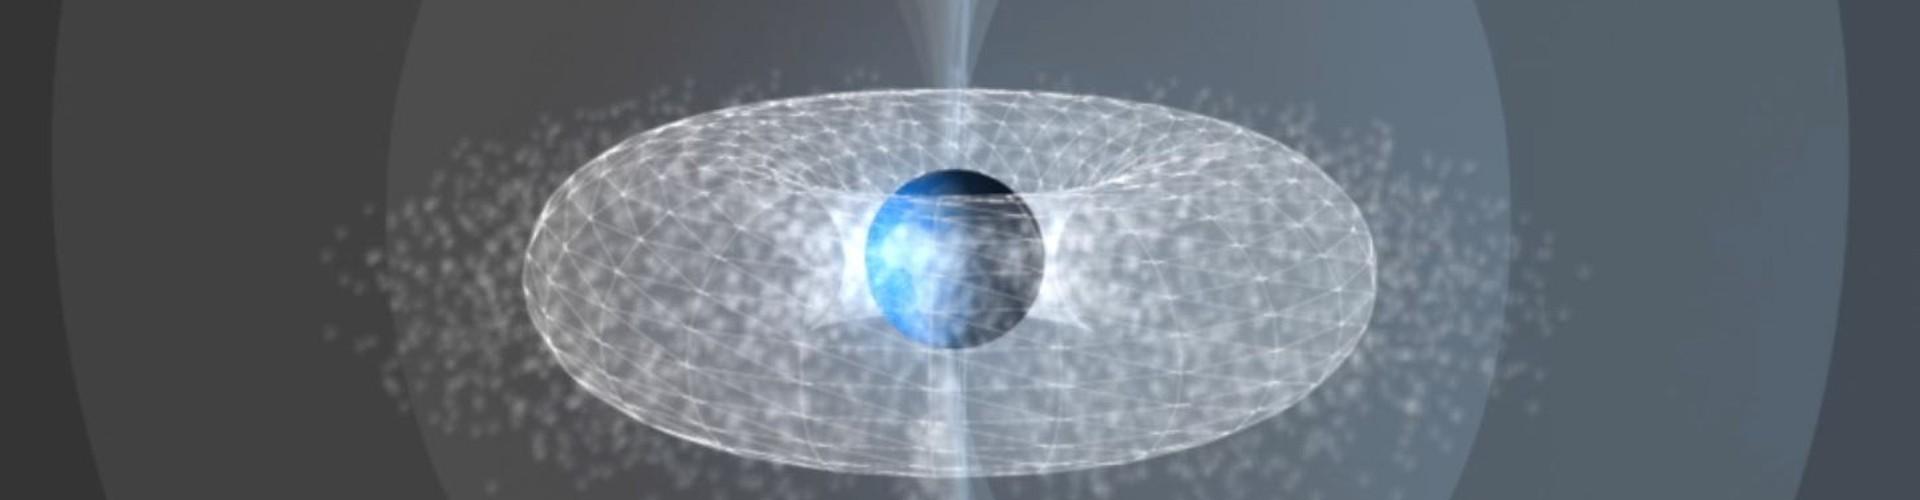 Plasma outflow from plasmasphere to magnetosphere (Credit: ESA/ATG medialab)